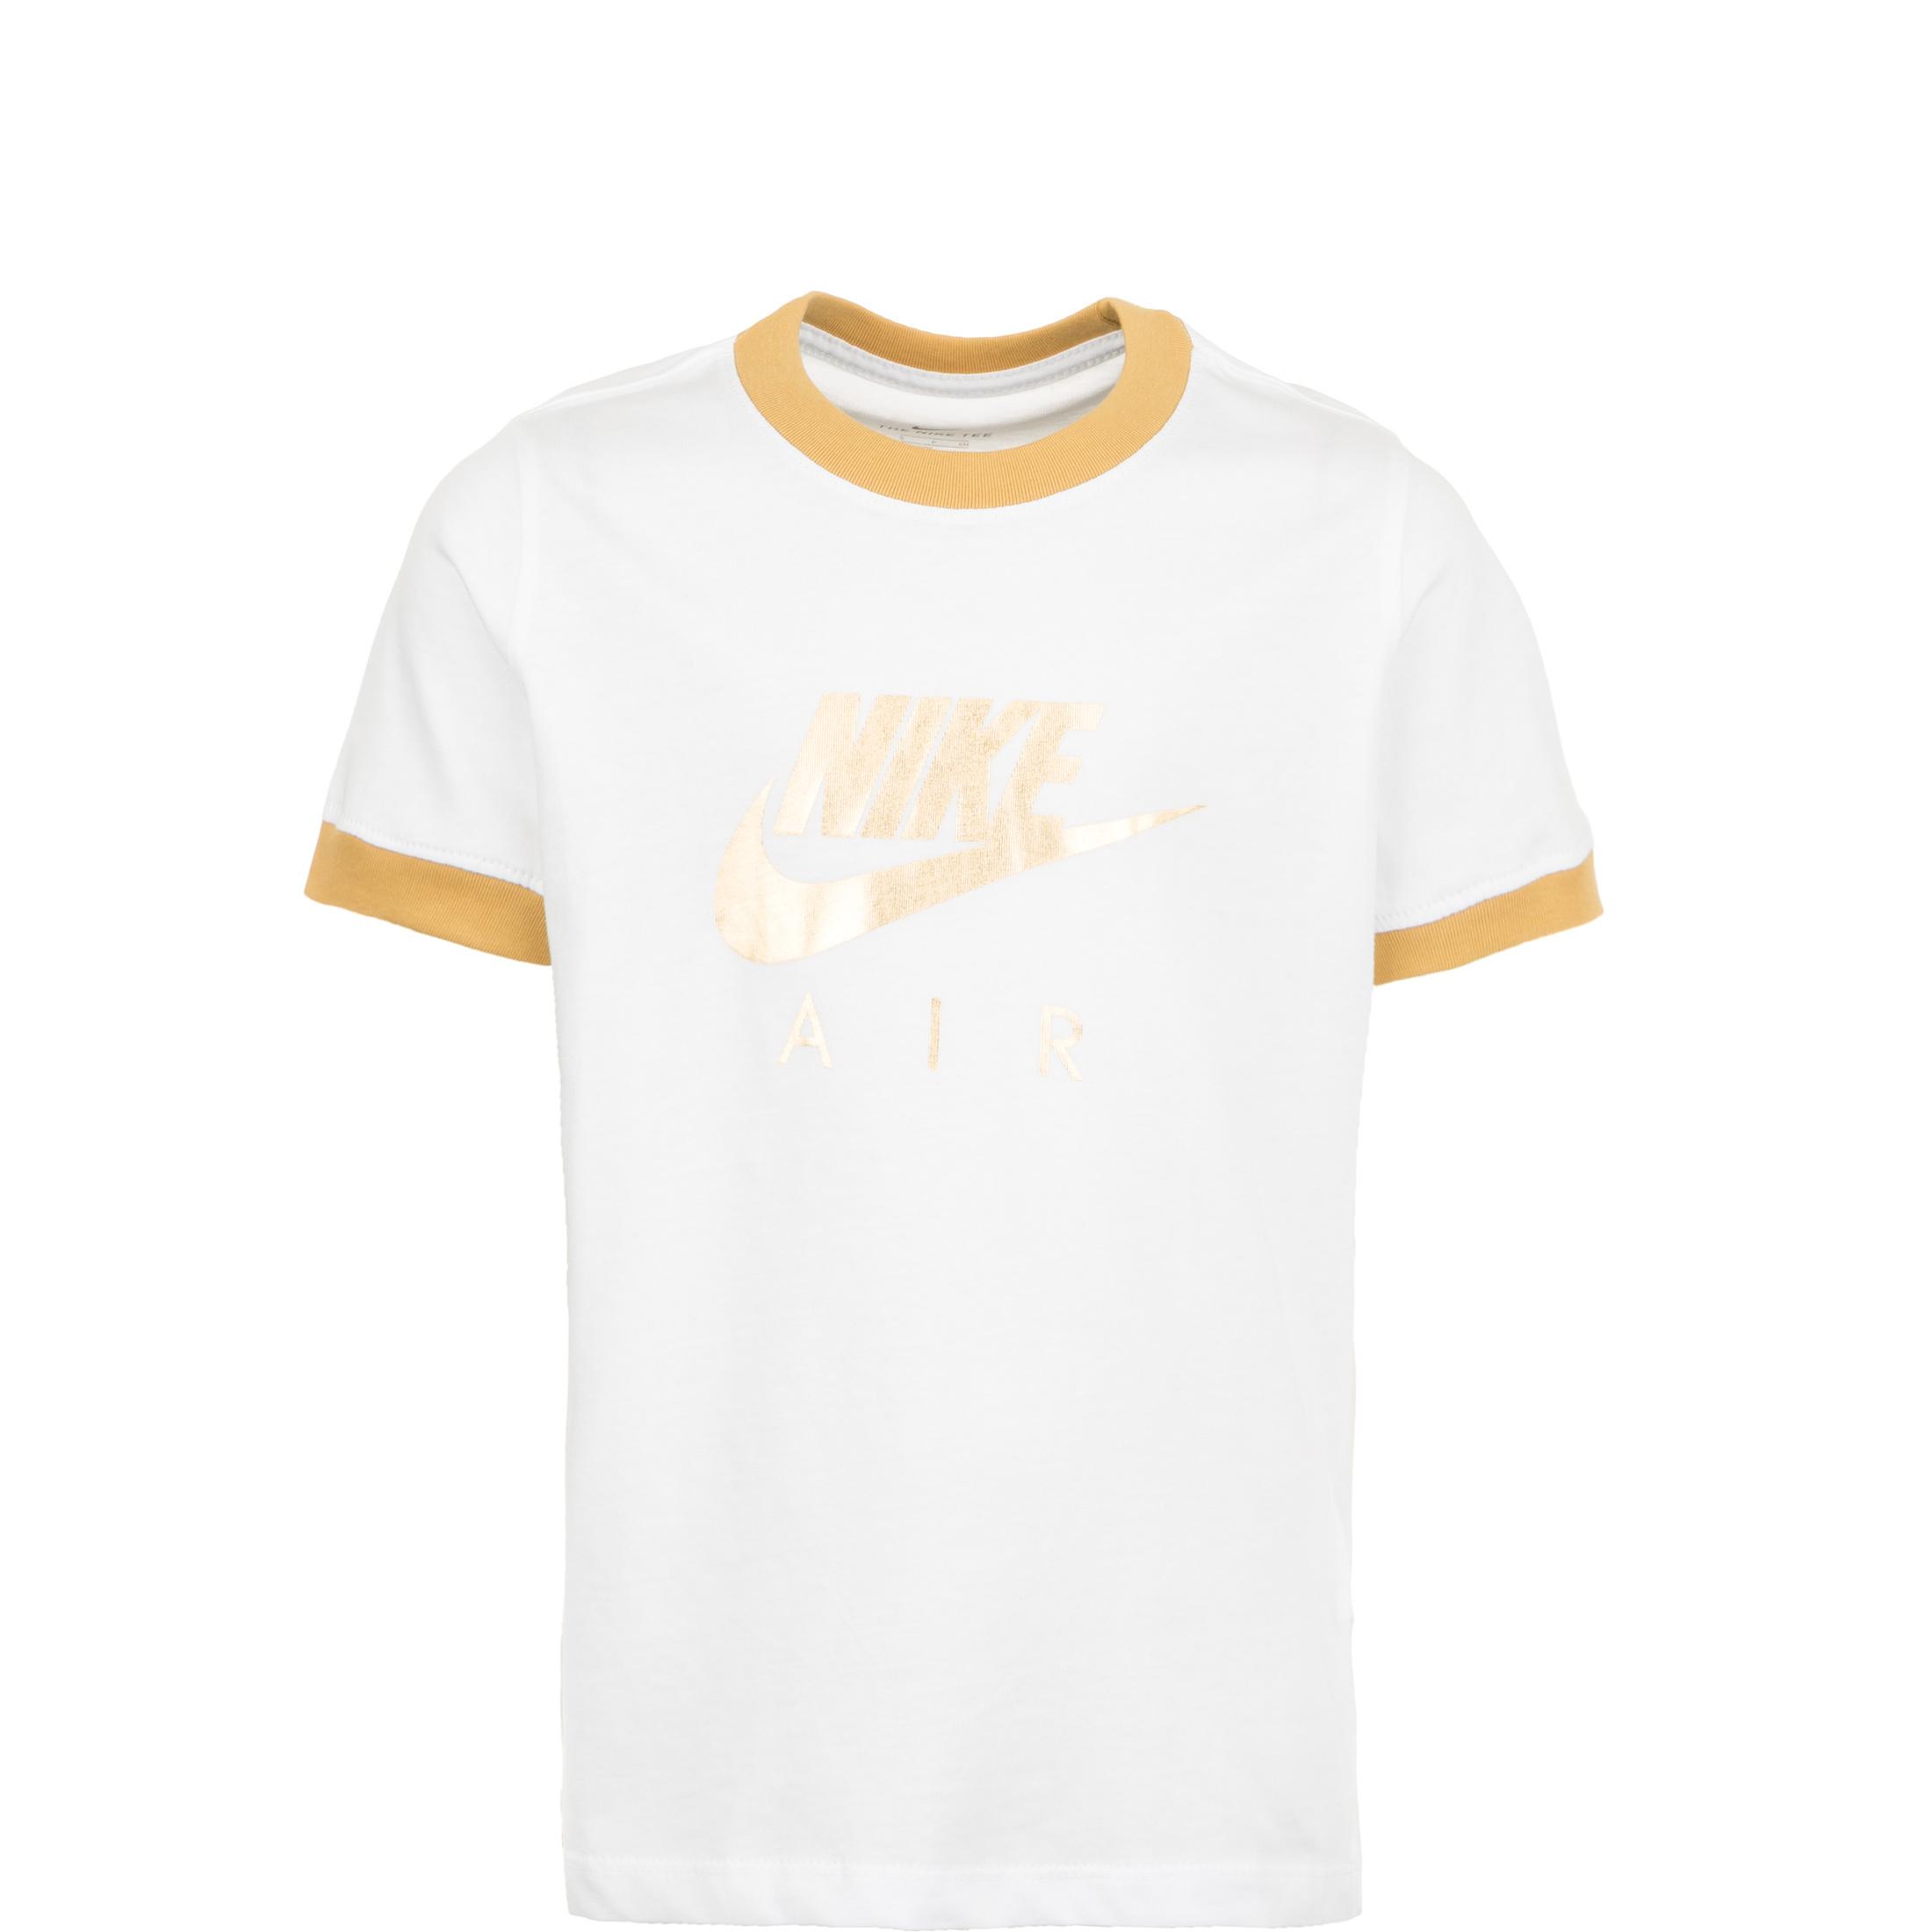 Nike Air T Shirt für ältere Kinder whitemetallic gold CI8325 101